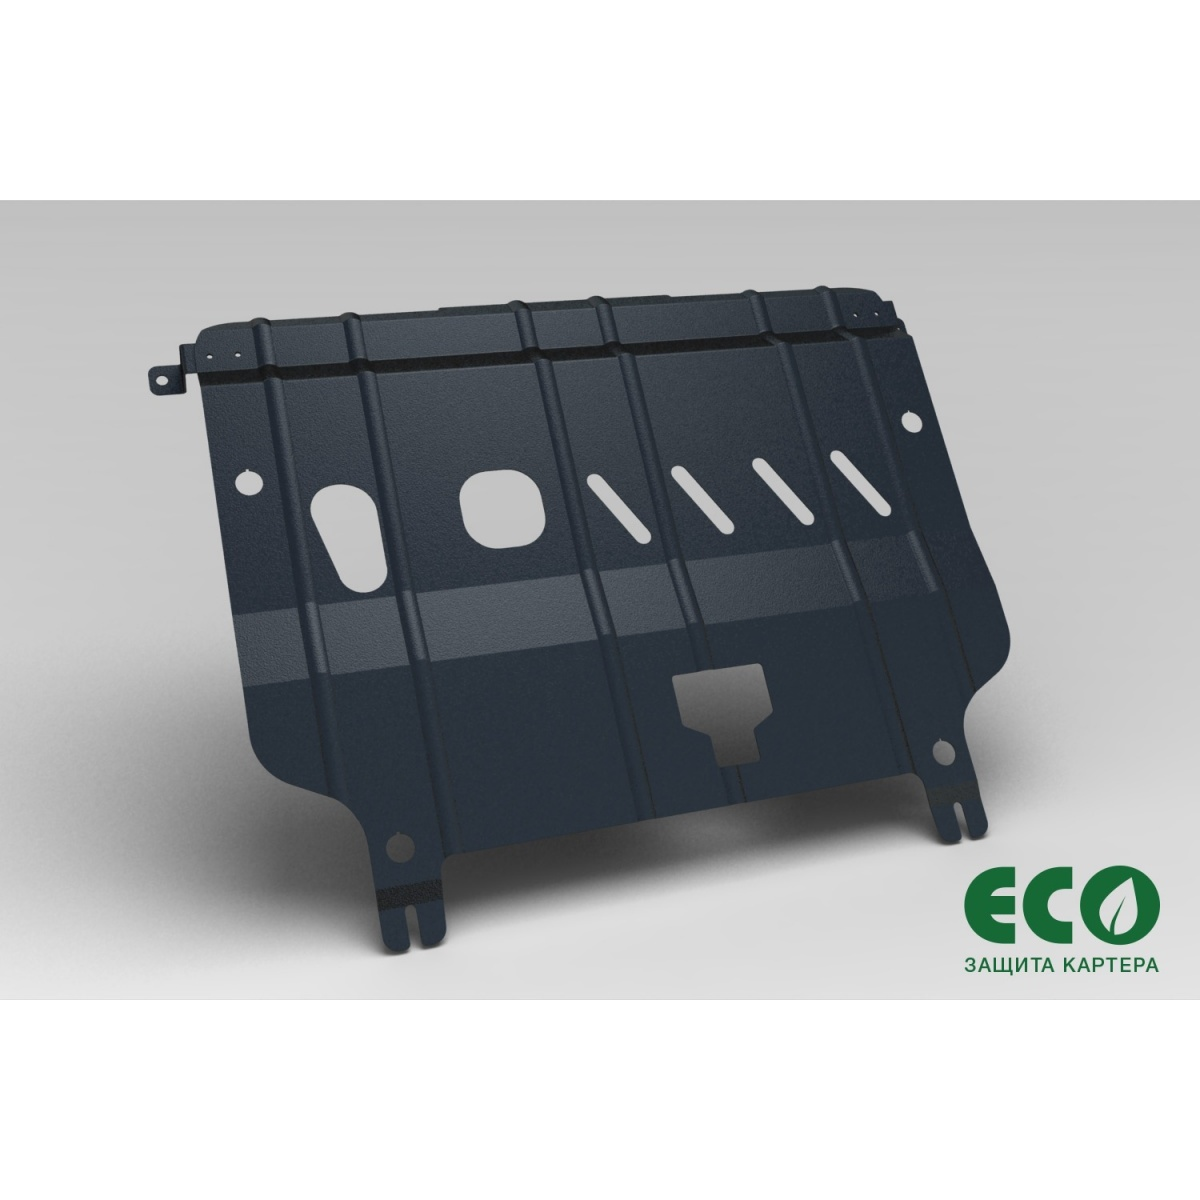 Kit ZK fastener eco Hyundai Solaris ...